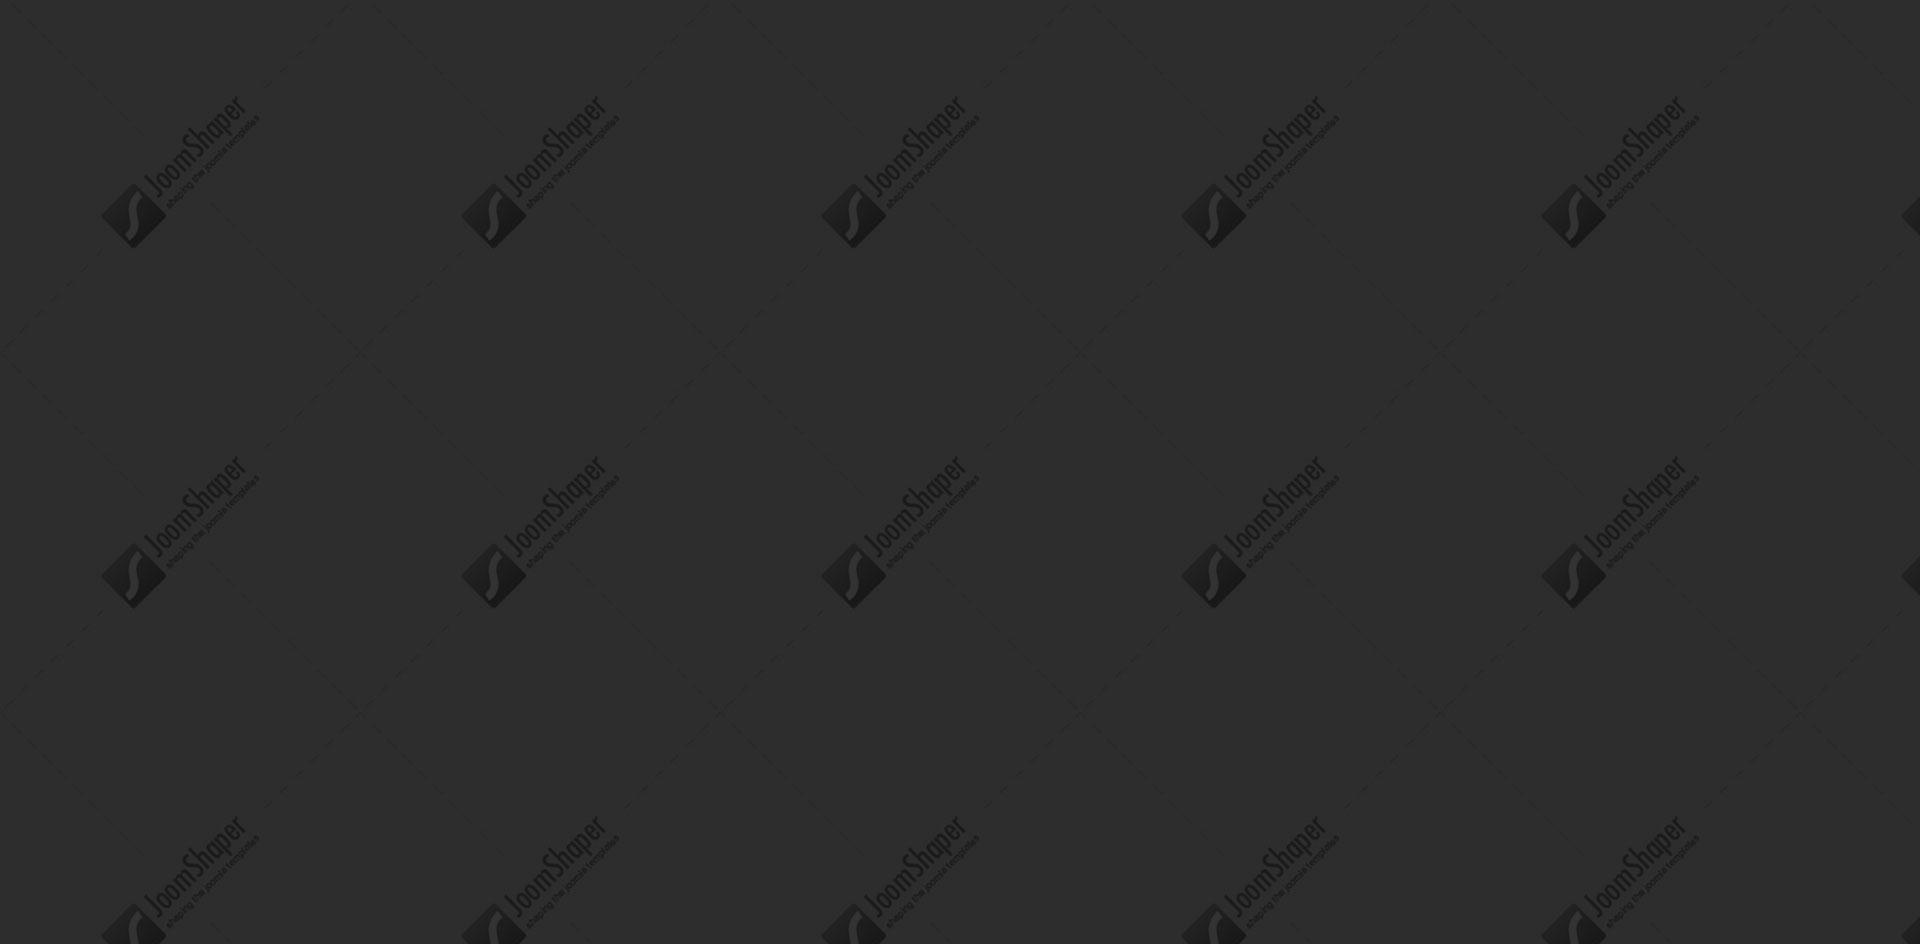 gallery-bg.jpg - 42.27 kb